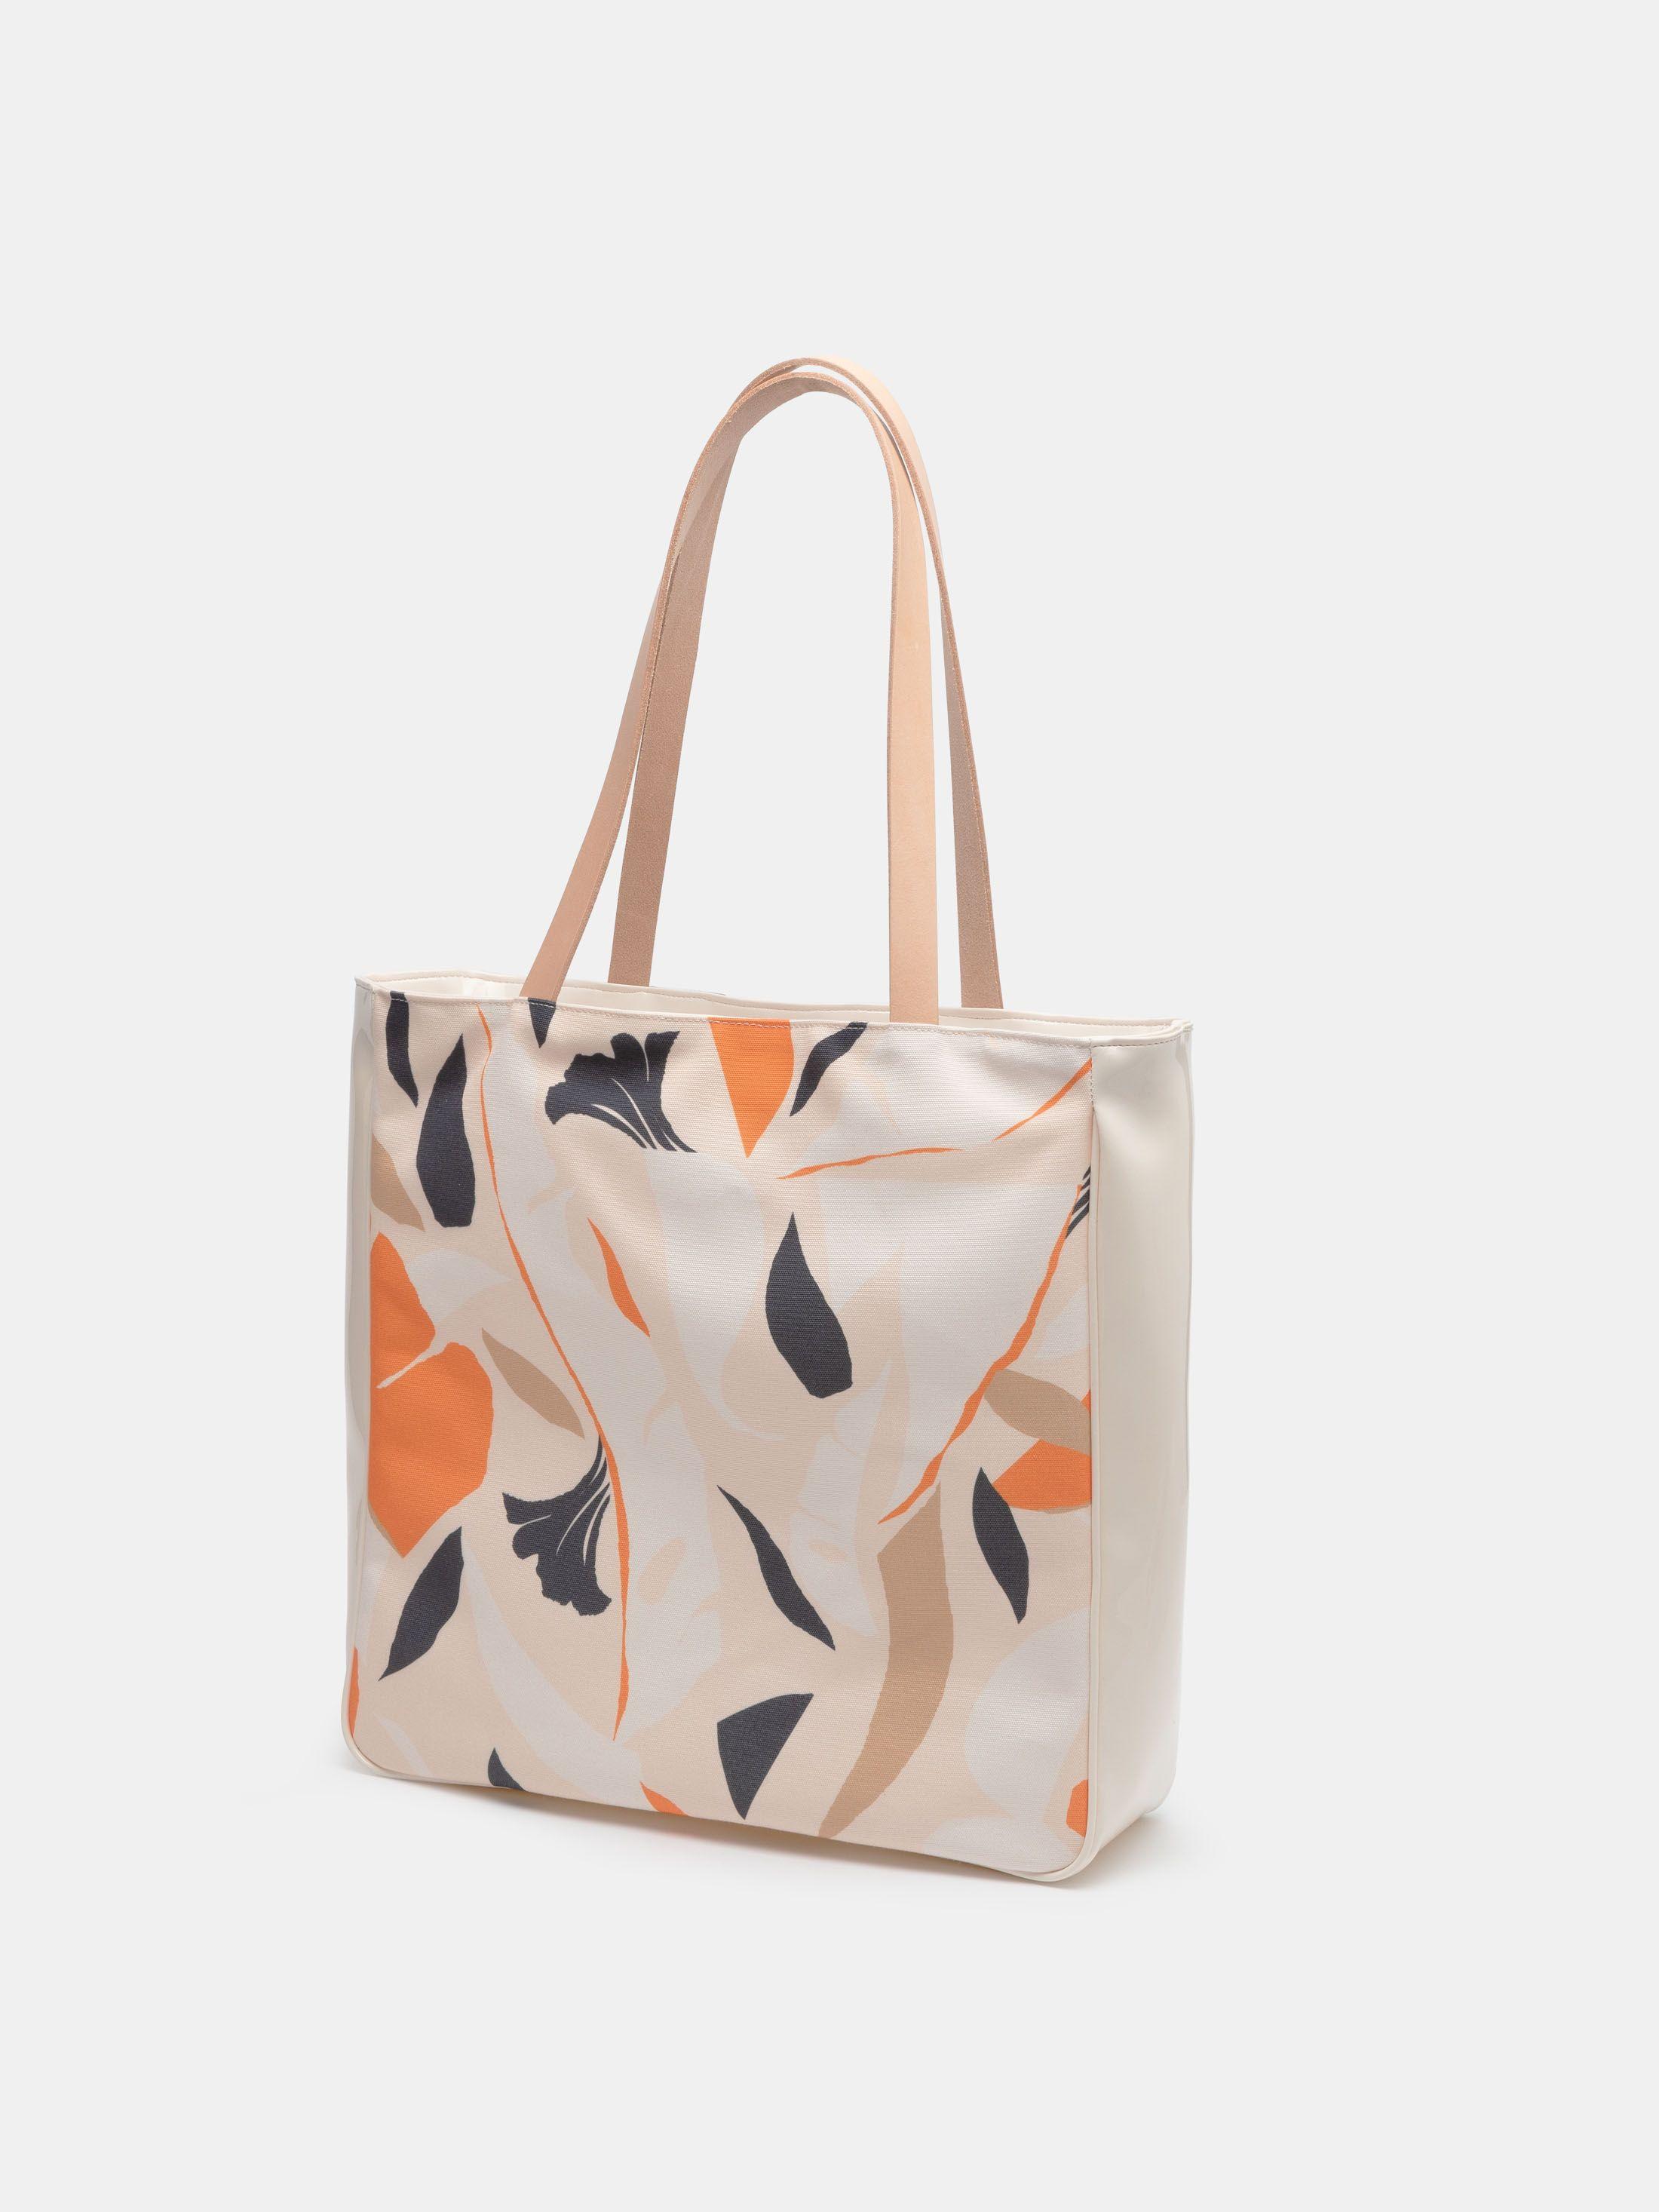 handmade beach bags